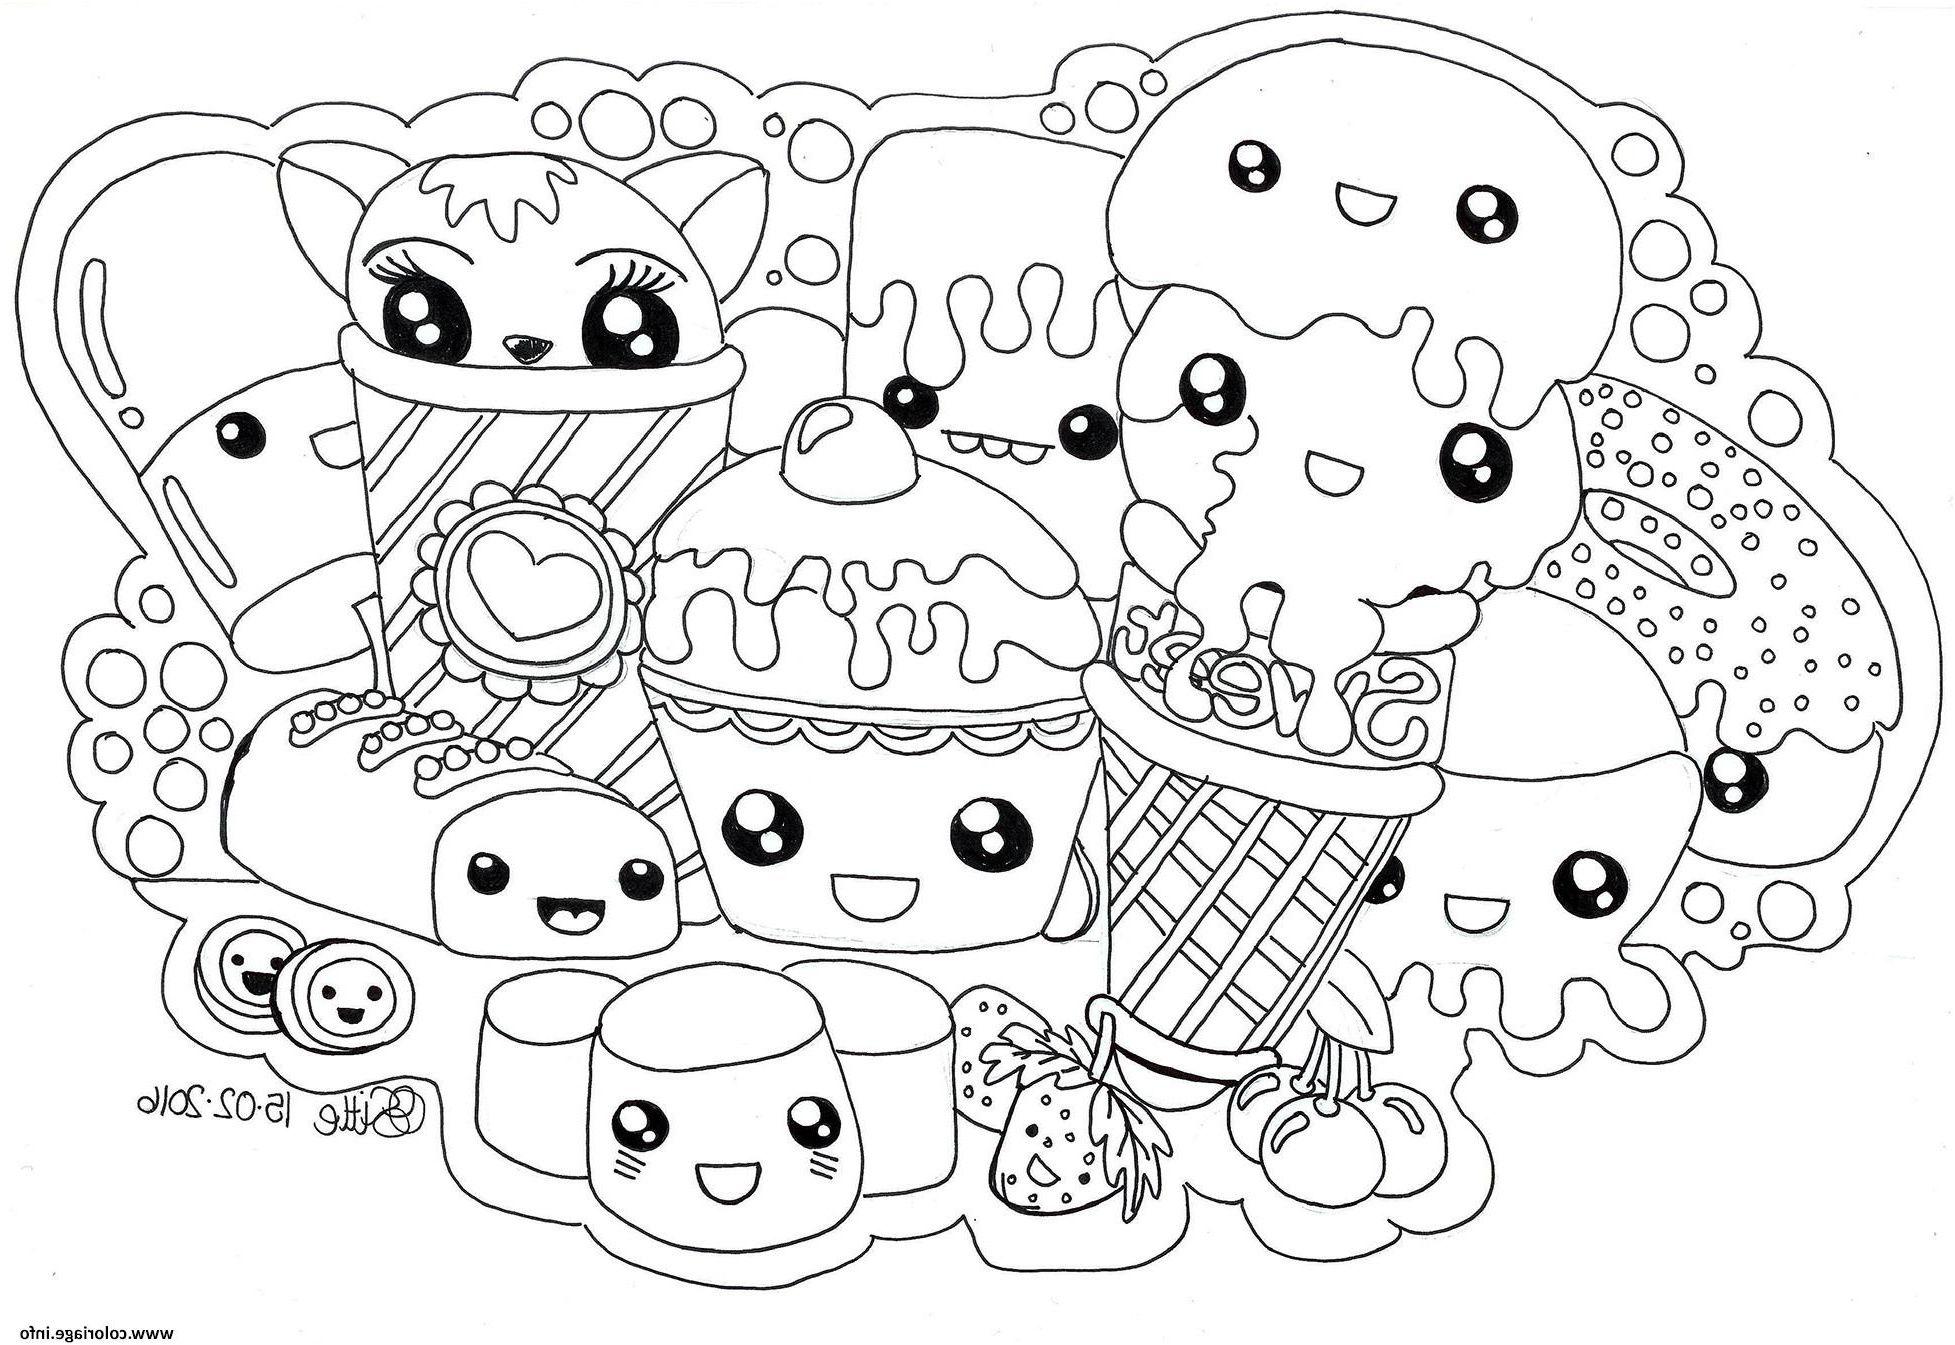 Get 19+] Cute Coloriage Kawaii Animaux Mignon